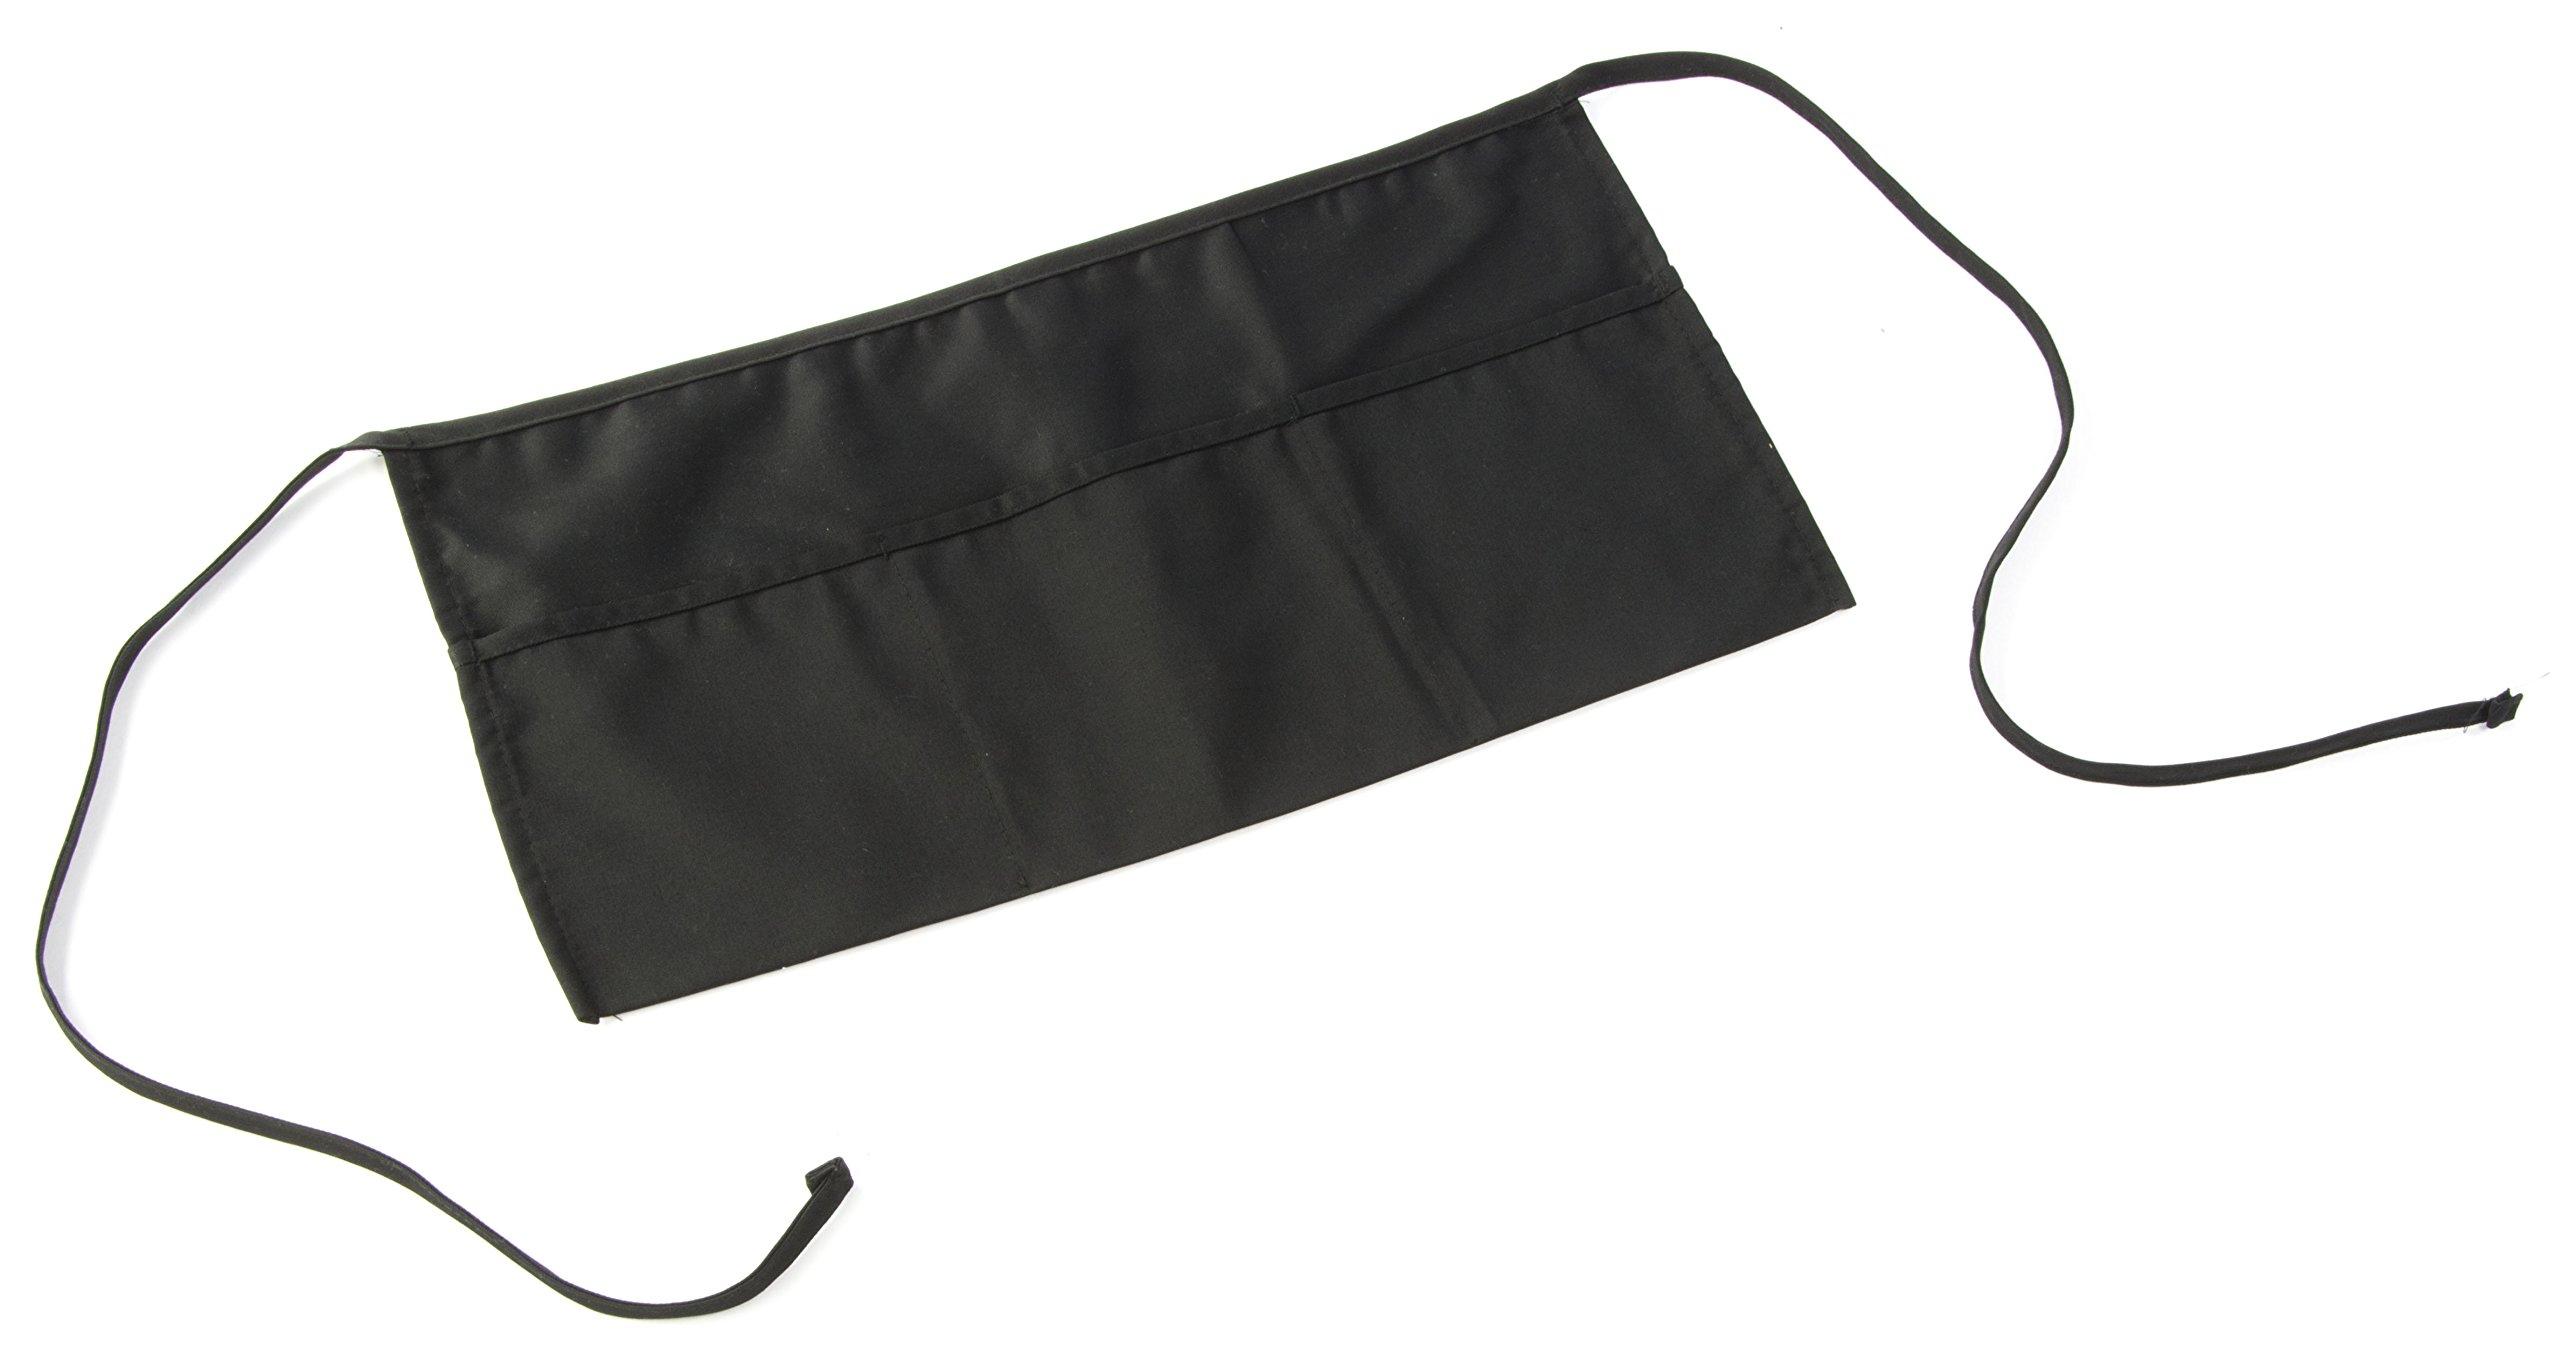 Displays2go Waist Apron, 3 Pocket, Wait Staff and Restaurant Uniform, Black, Set of 10 by Displays2go